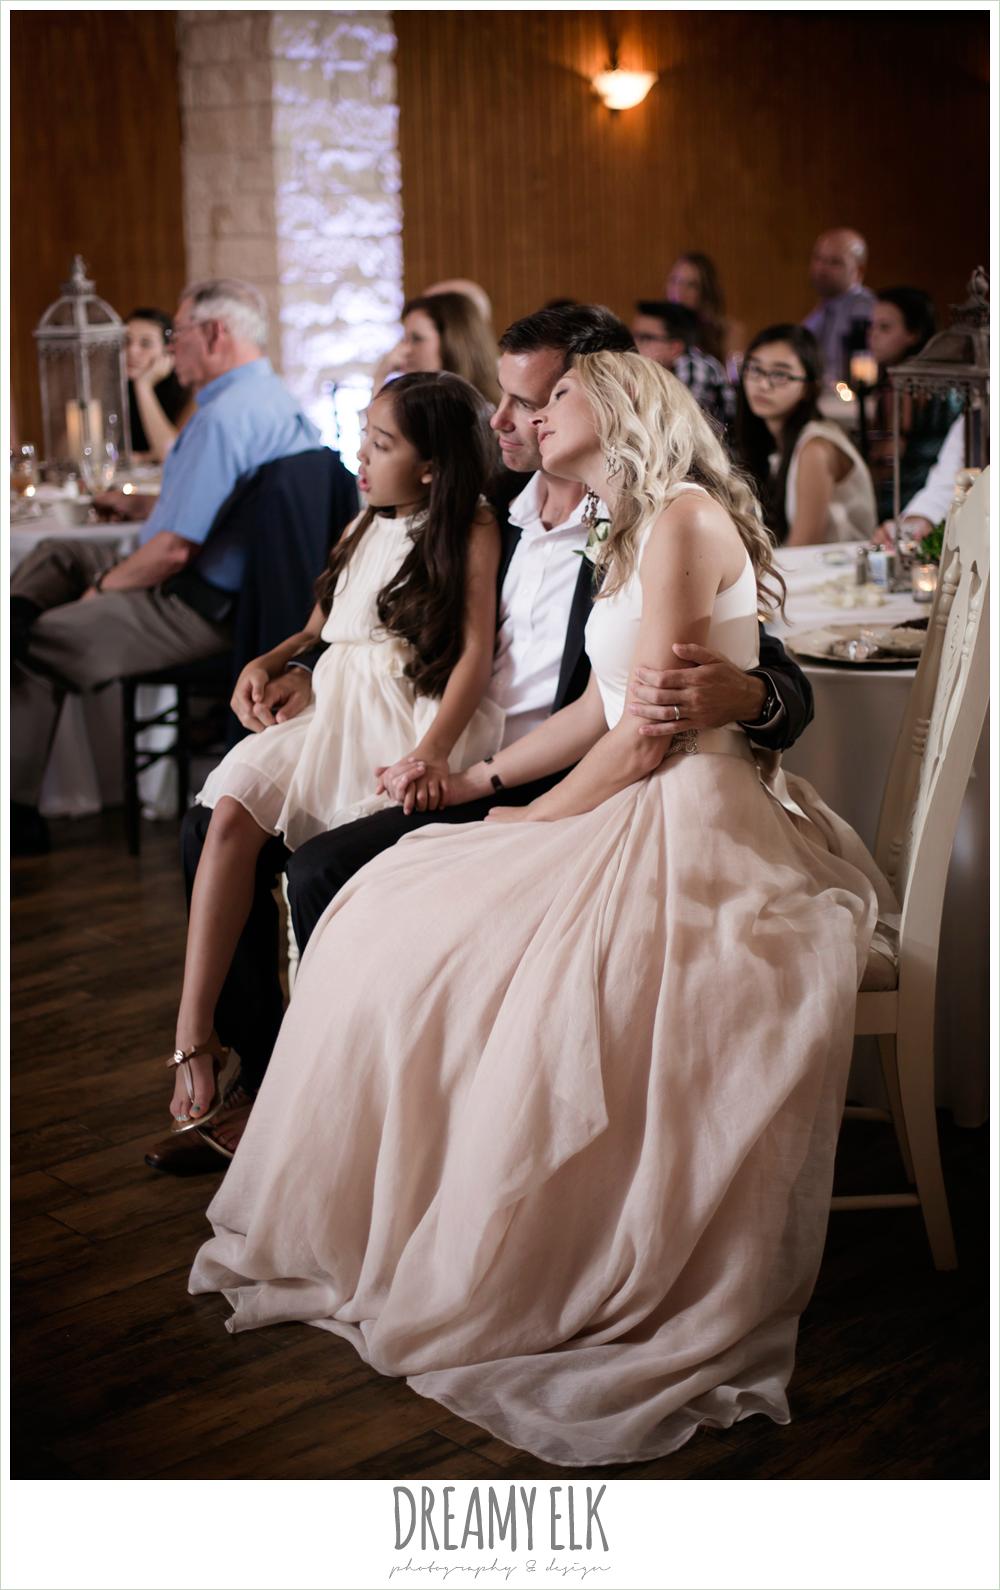 carol hannah kensington halter and blush skirt, bride and groom during wedding reception, july summer morning wedding, ashelynn manor, magnolia, texas {dreamy elk photography and design} photo